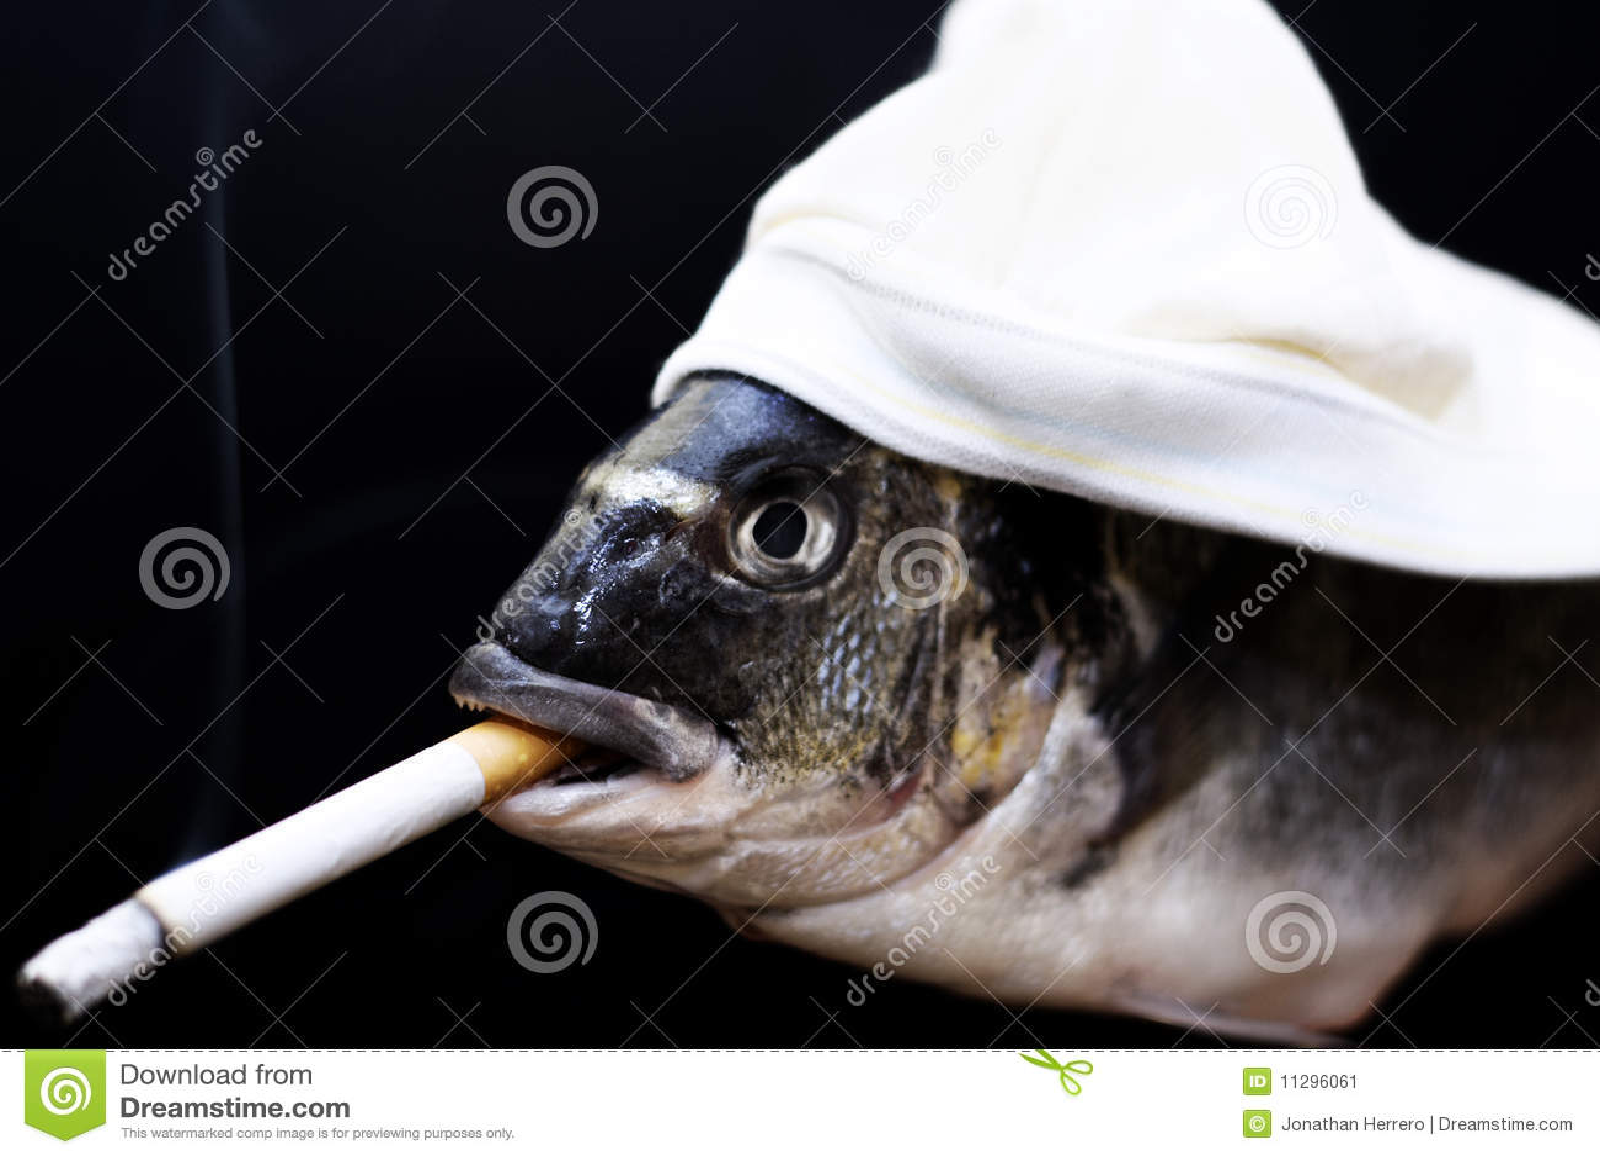 Smoking fish stock image image 11296061 for Smoking fish in a smoker